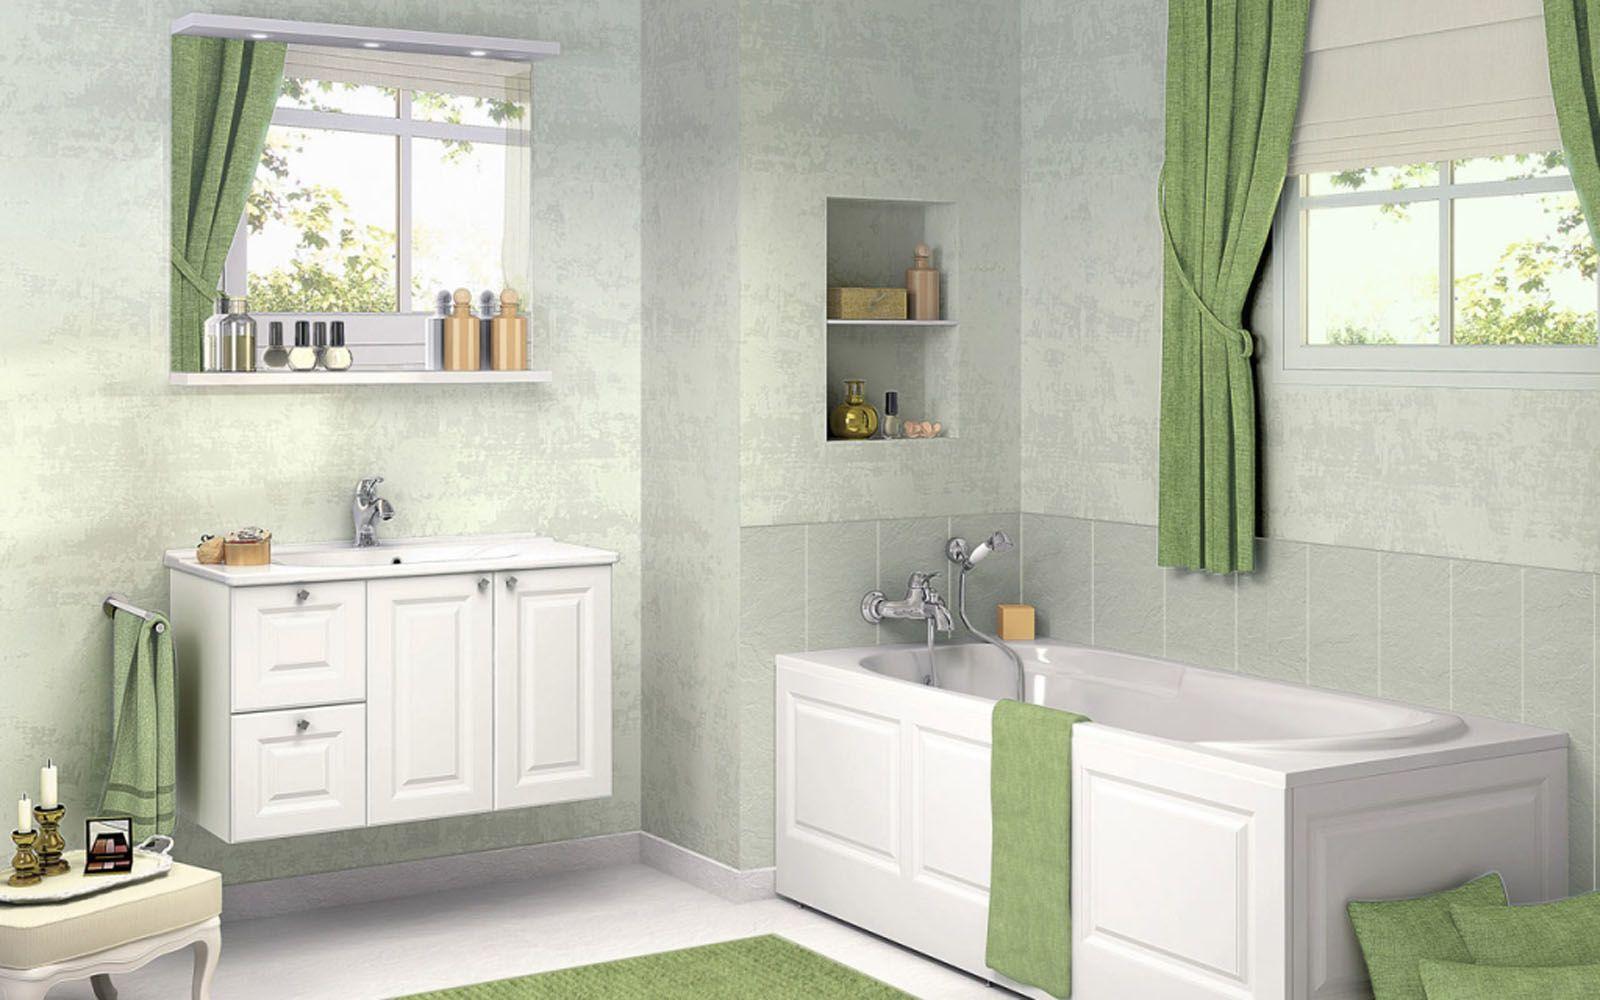 Small Window Curtains For Bedroom Badezimmer Grün Badezimmer Ohne Fenster Badezimmer